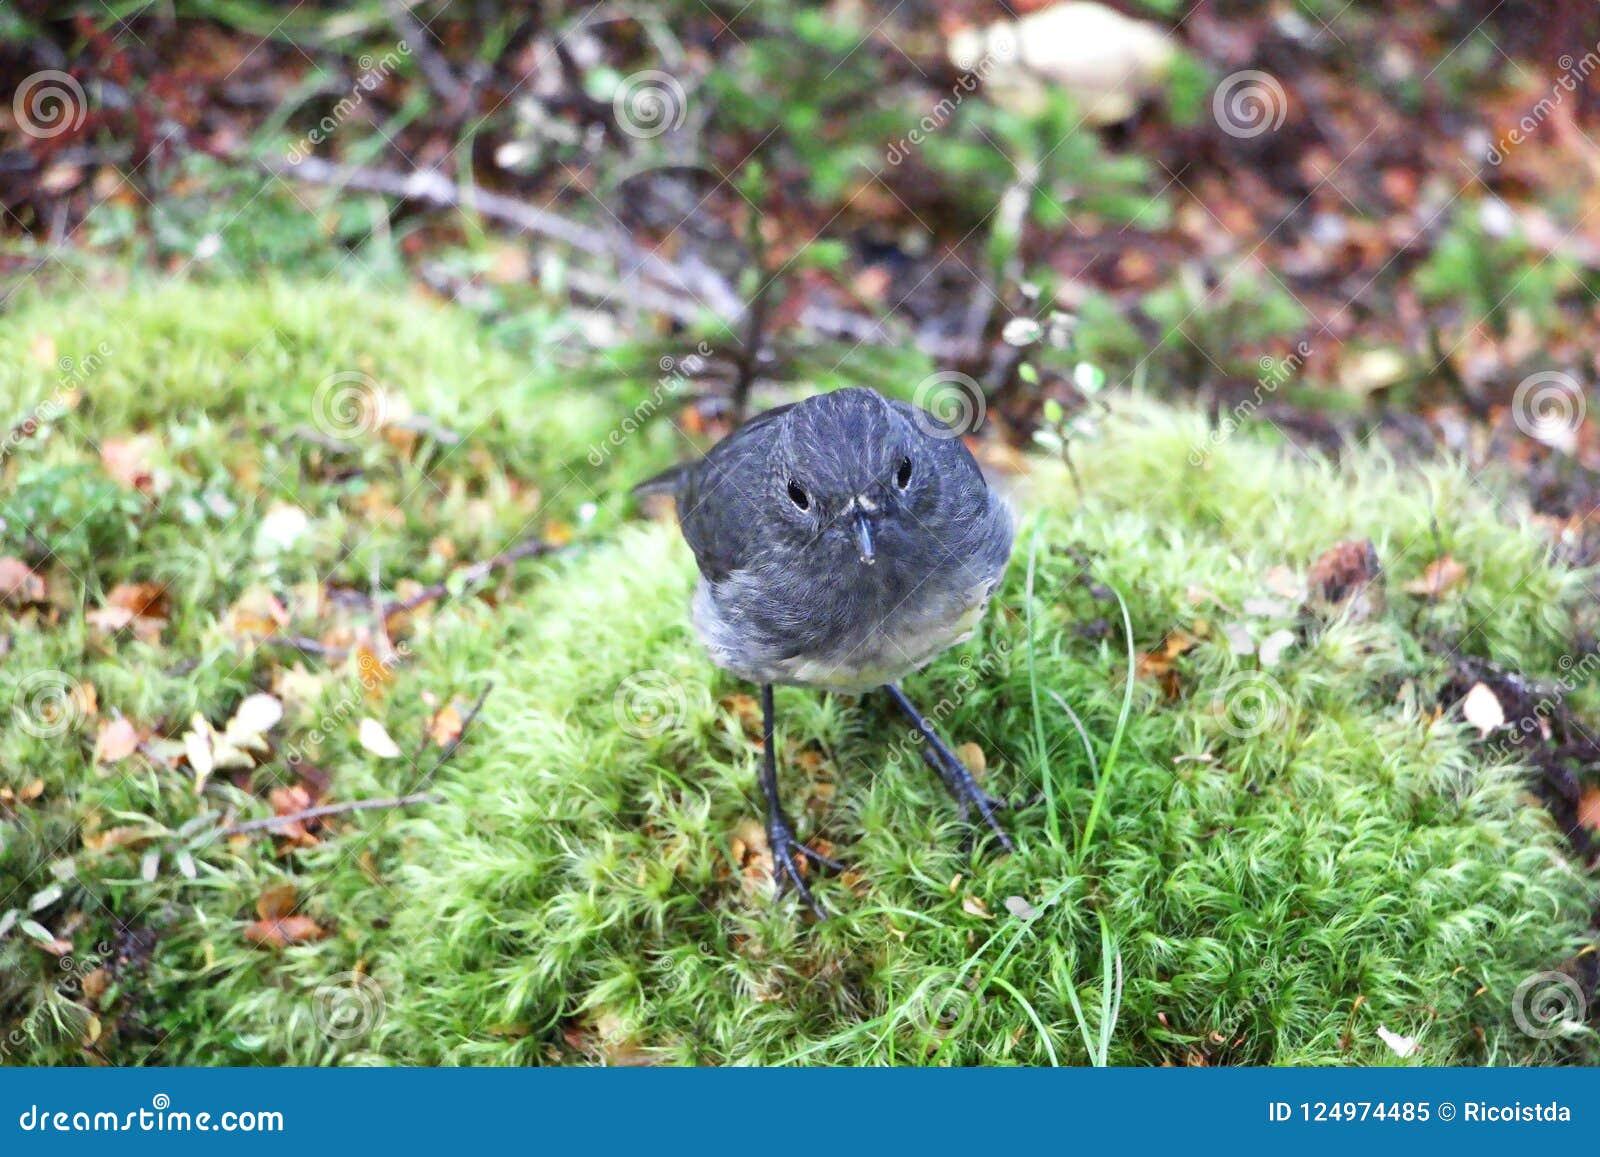 toutouwai bird in New Zealand sitting on branch